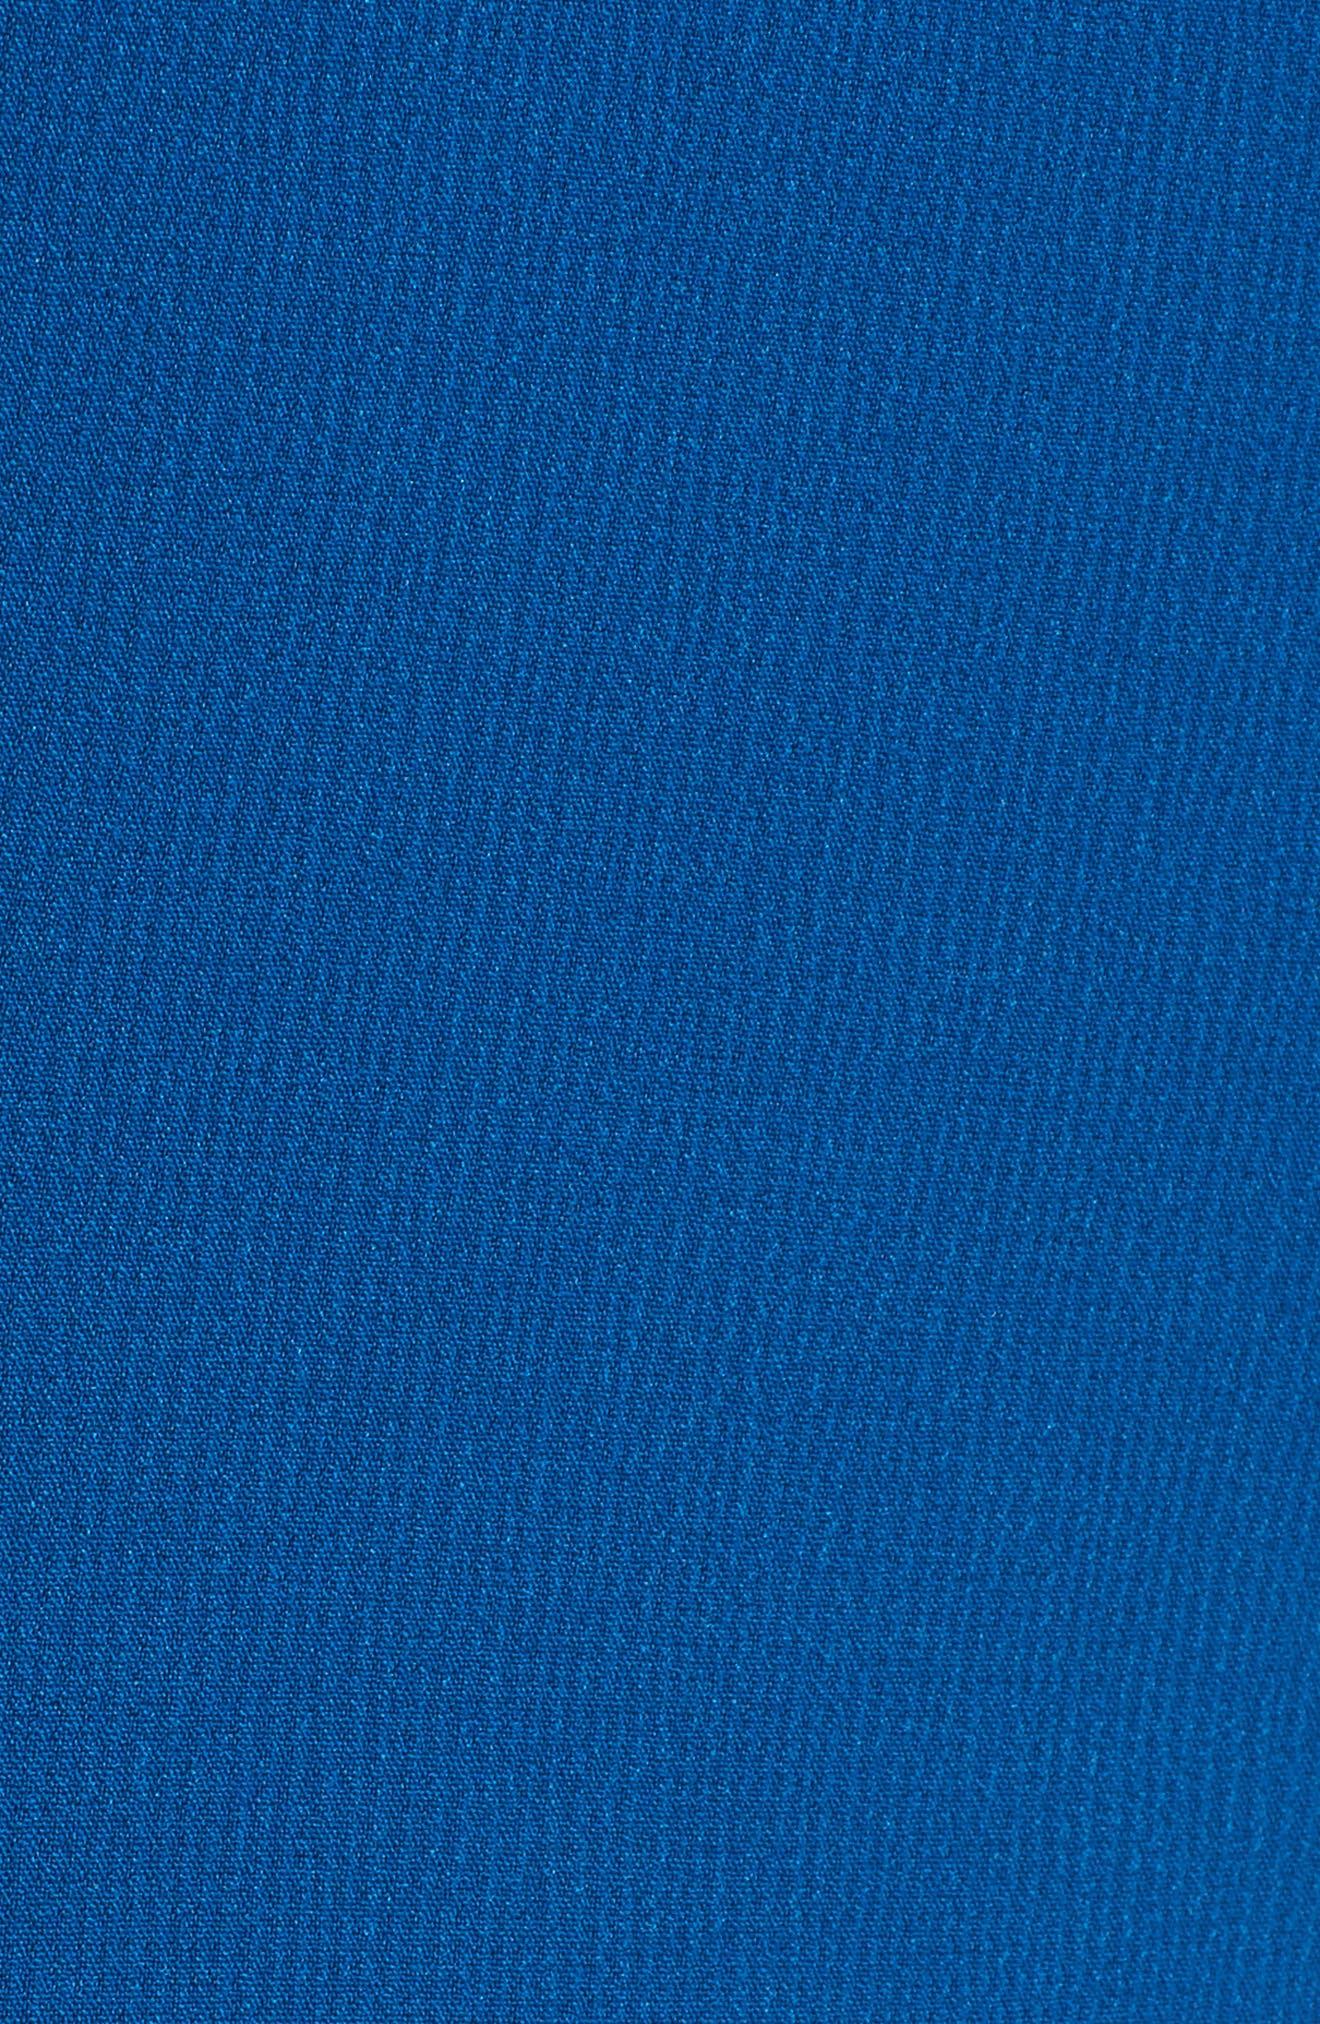 Danafea Zip Detail Sheath Dress,                             Alternate thumbnail 5, color,                             424